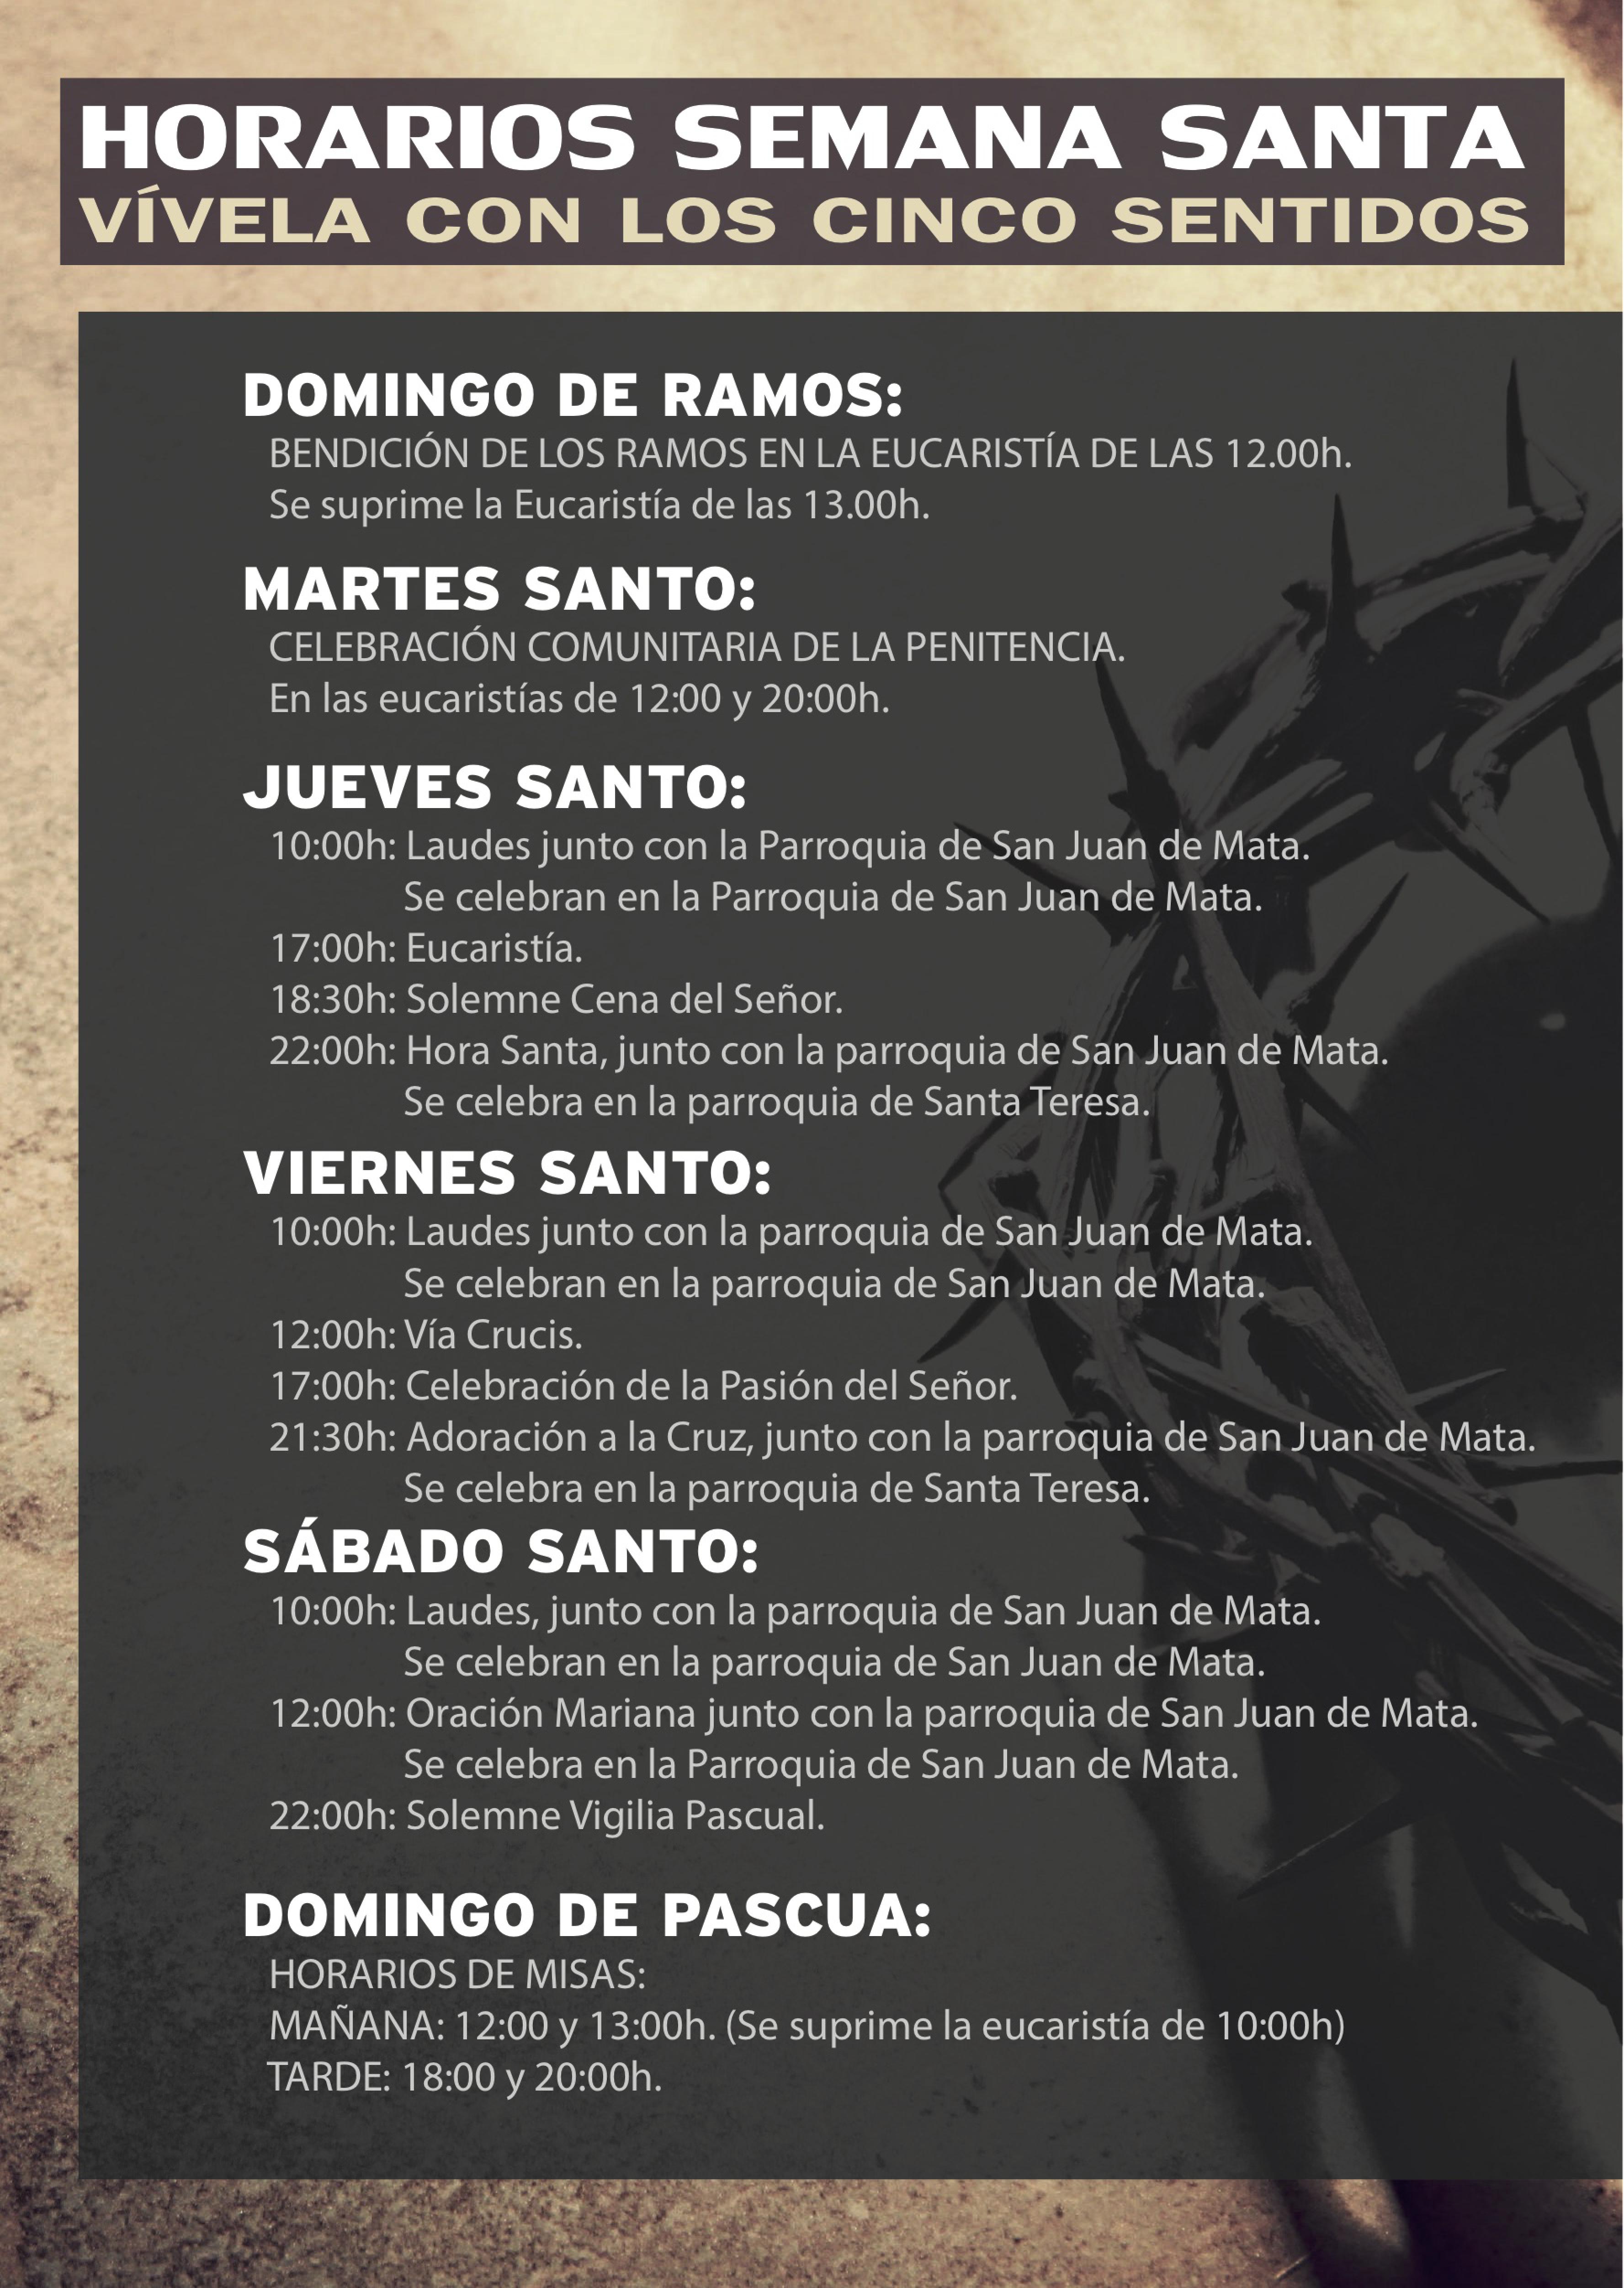 Calendario Perpetuo Semana Santa.Horarios Semana Santa 2018 Parroquia Santa Teresa